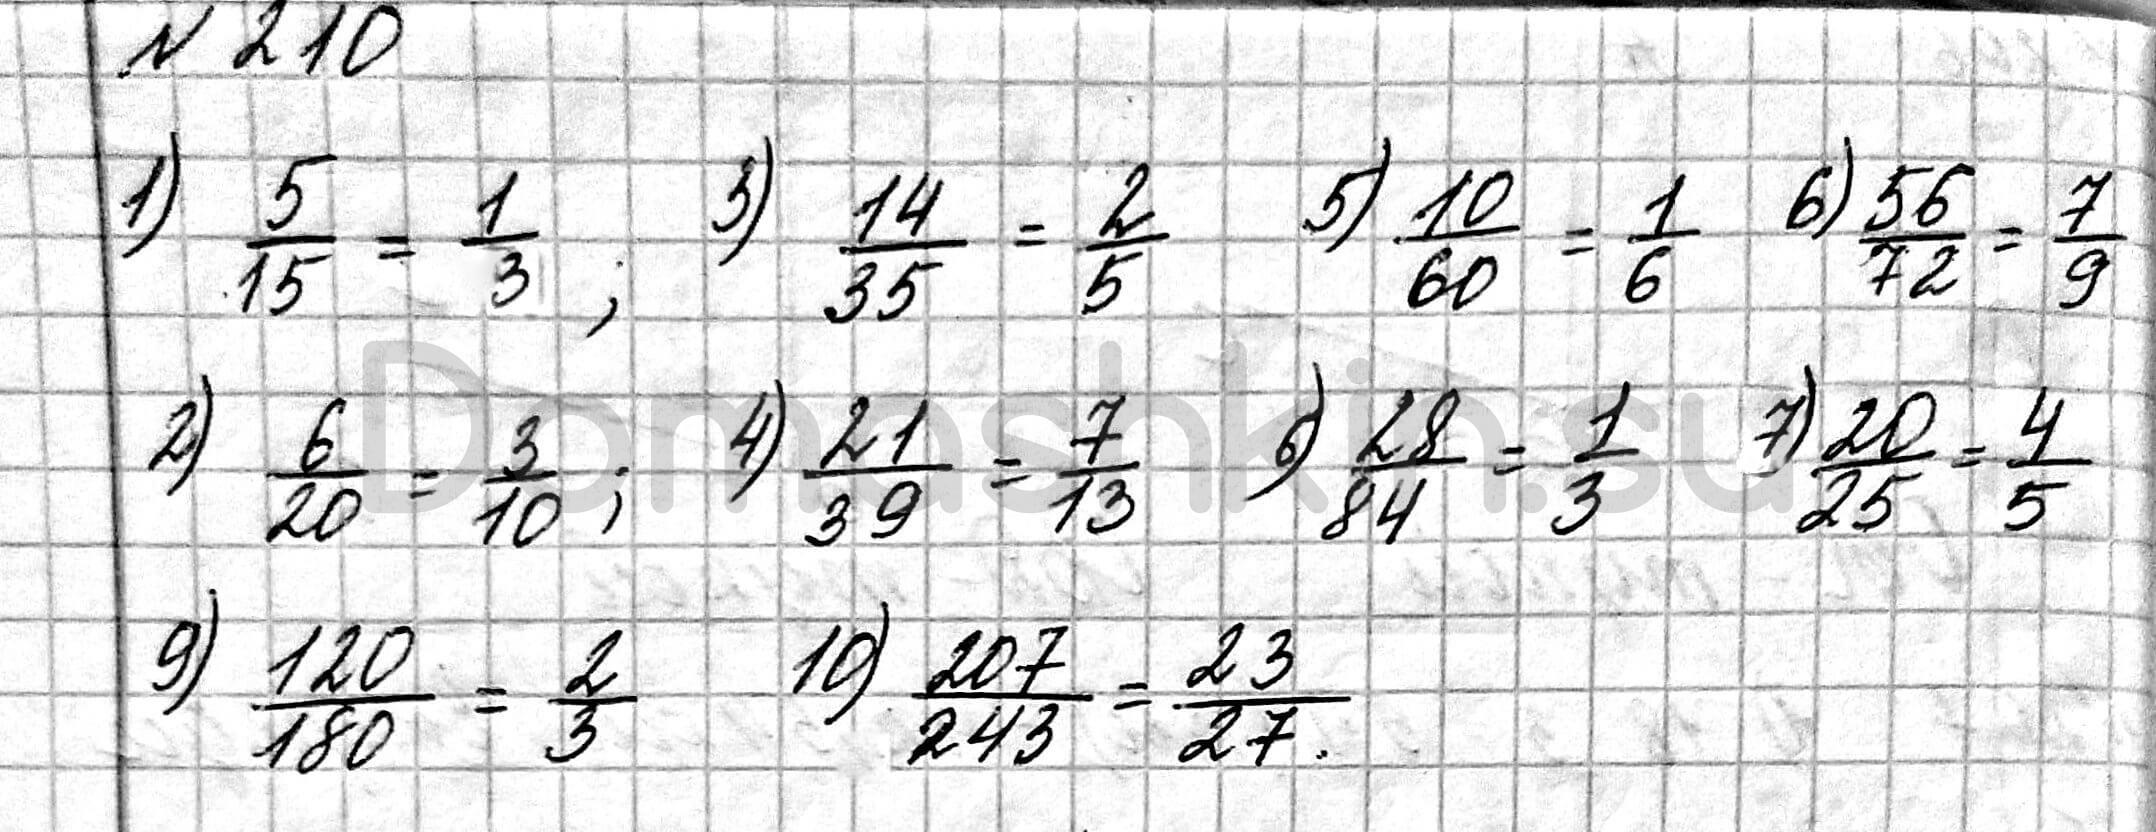 Математика 6 класс учебник Мерзляк номер 210 решение